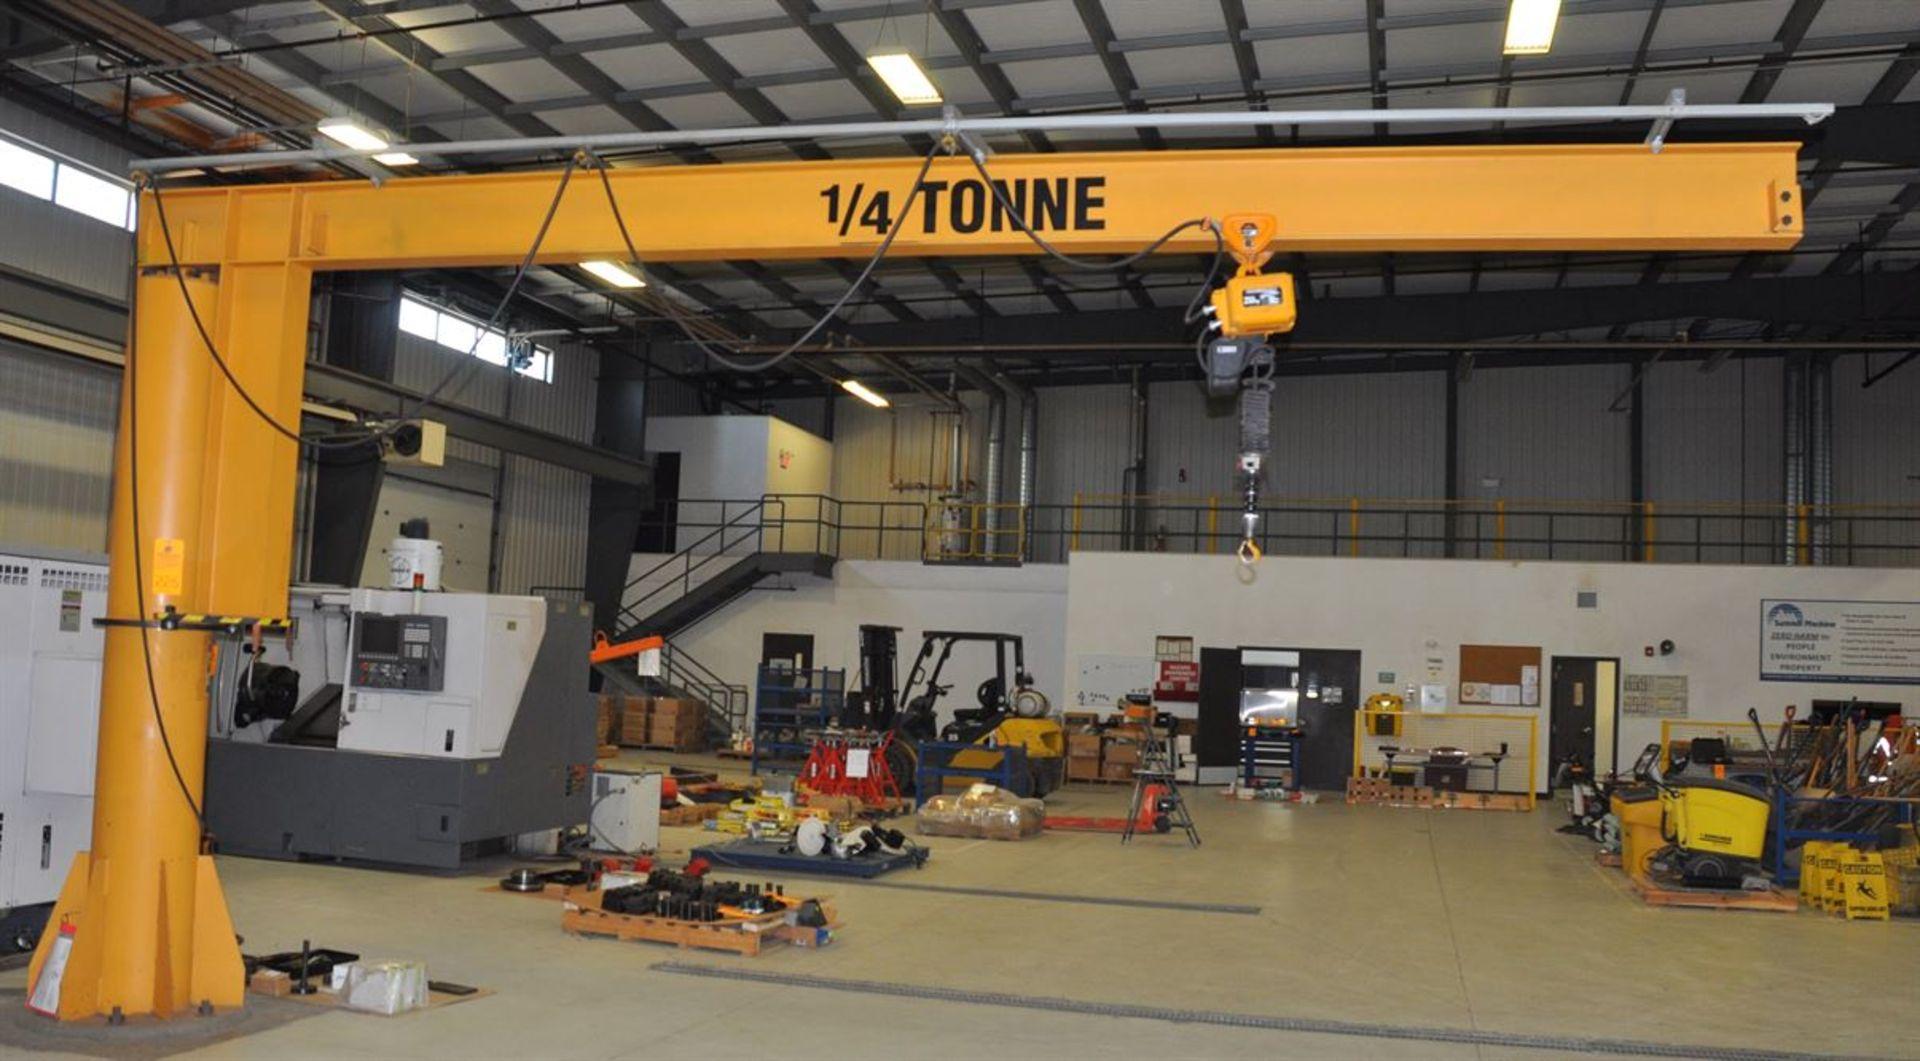 TEKO ¼ Tonne Free Standing Jib Crane, w/ KITO 250 kg Electric Chain Hoist - Image 2 of 2